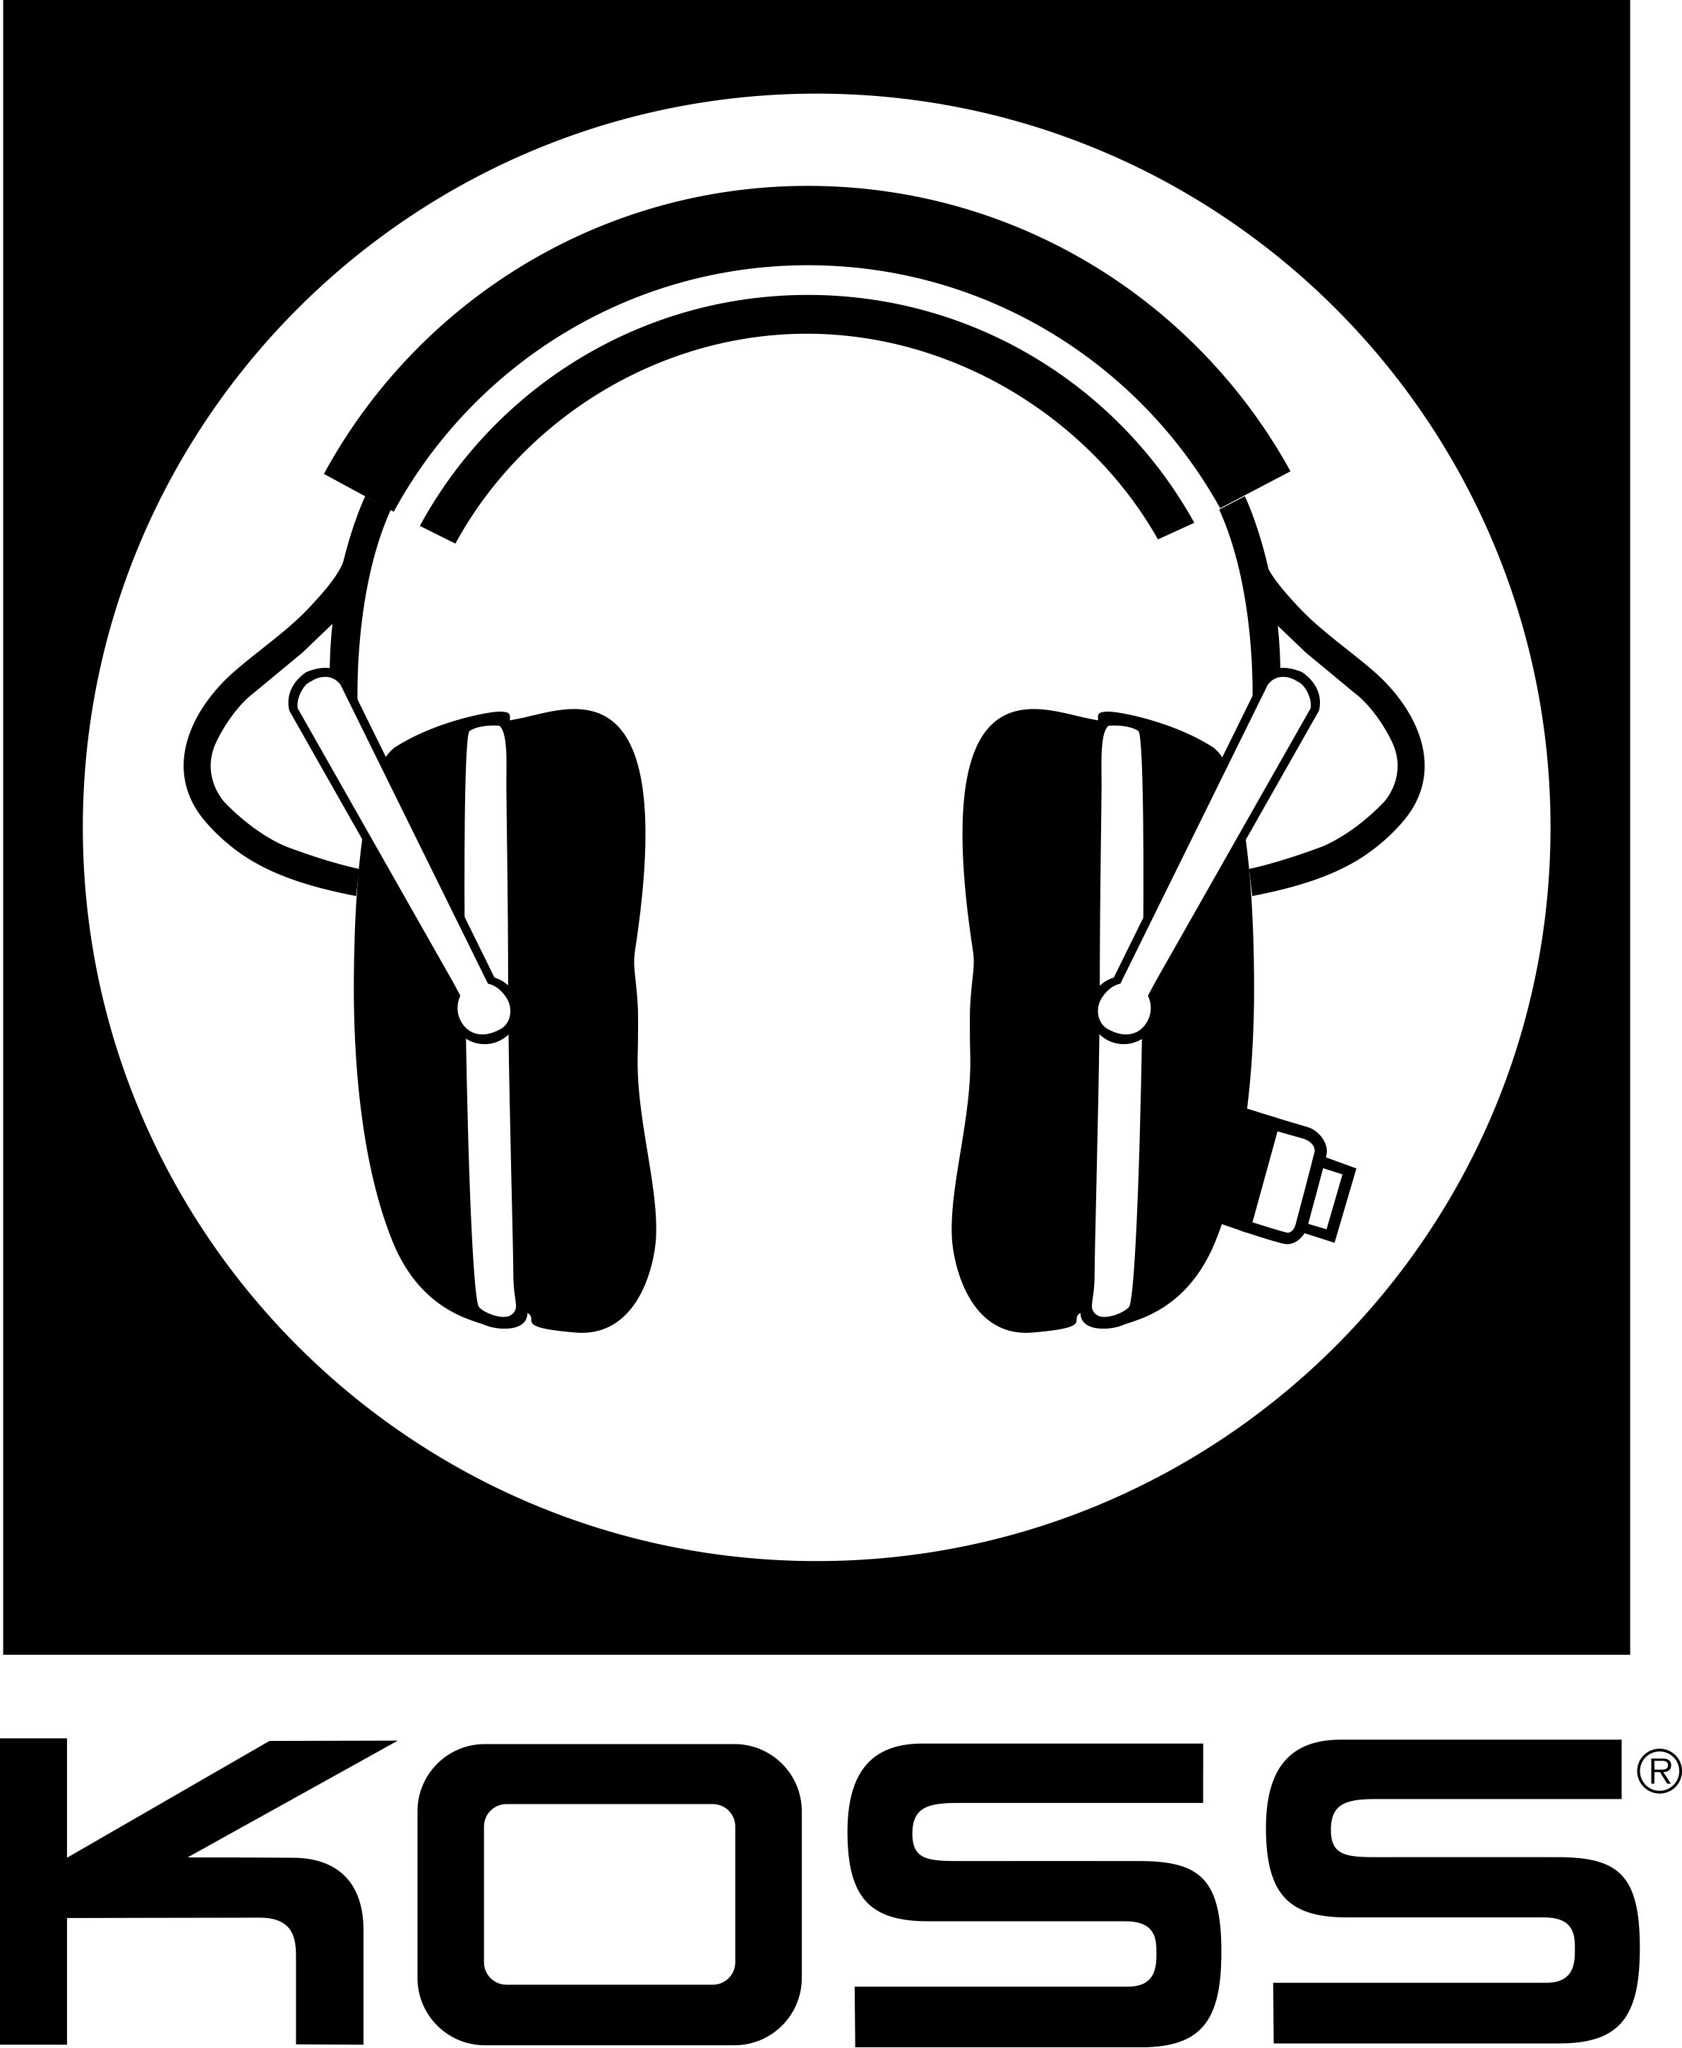 koss stock logo